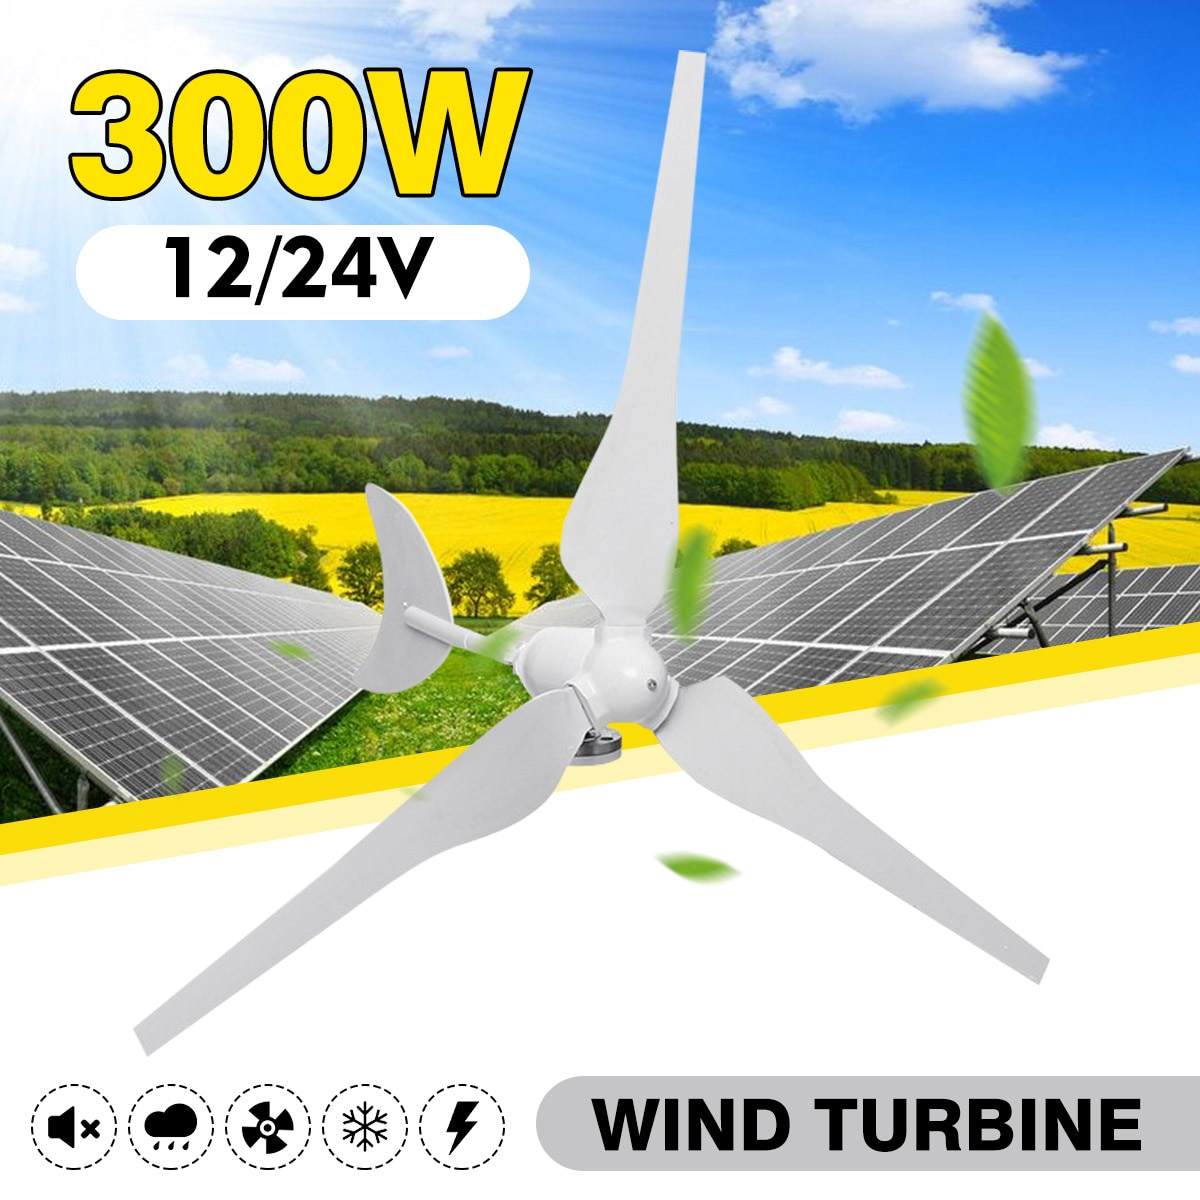 Wind Generator 300W AC12V/24V Wind Turbines Wind Turbines Generator with 3 Nylon Fiber Blades for Home Solar Streetlight ,Boat